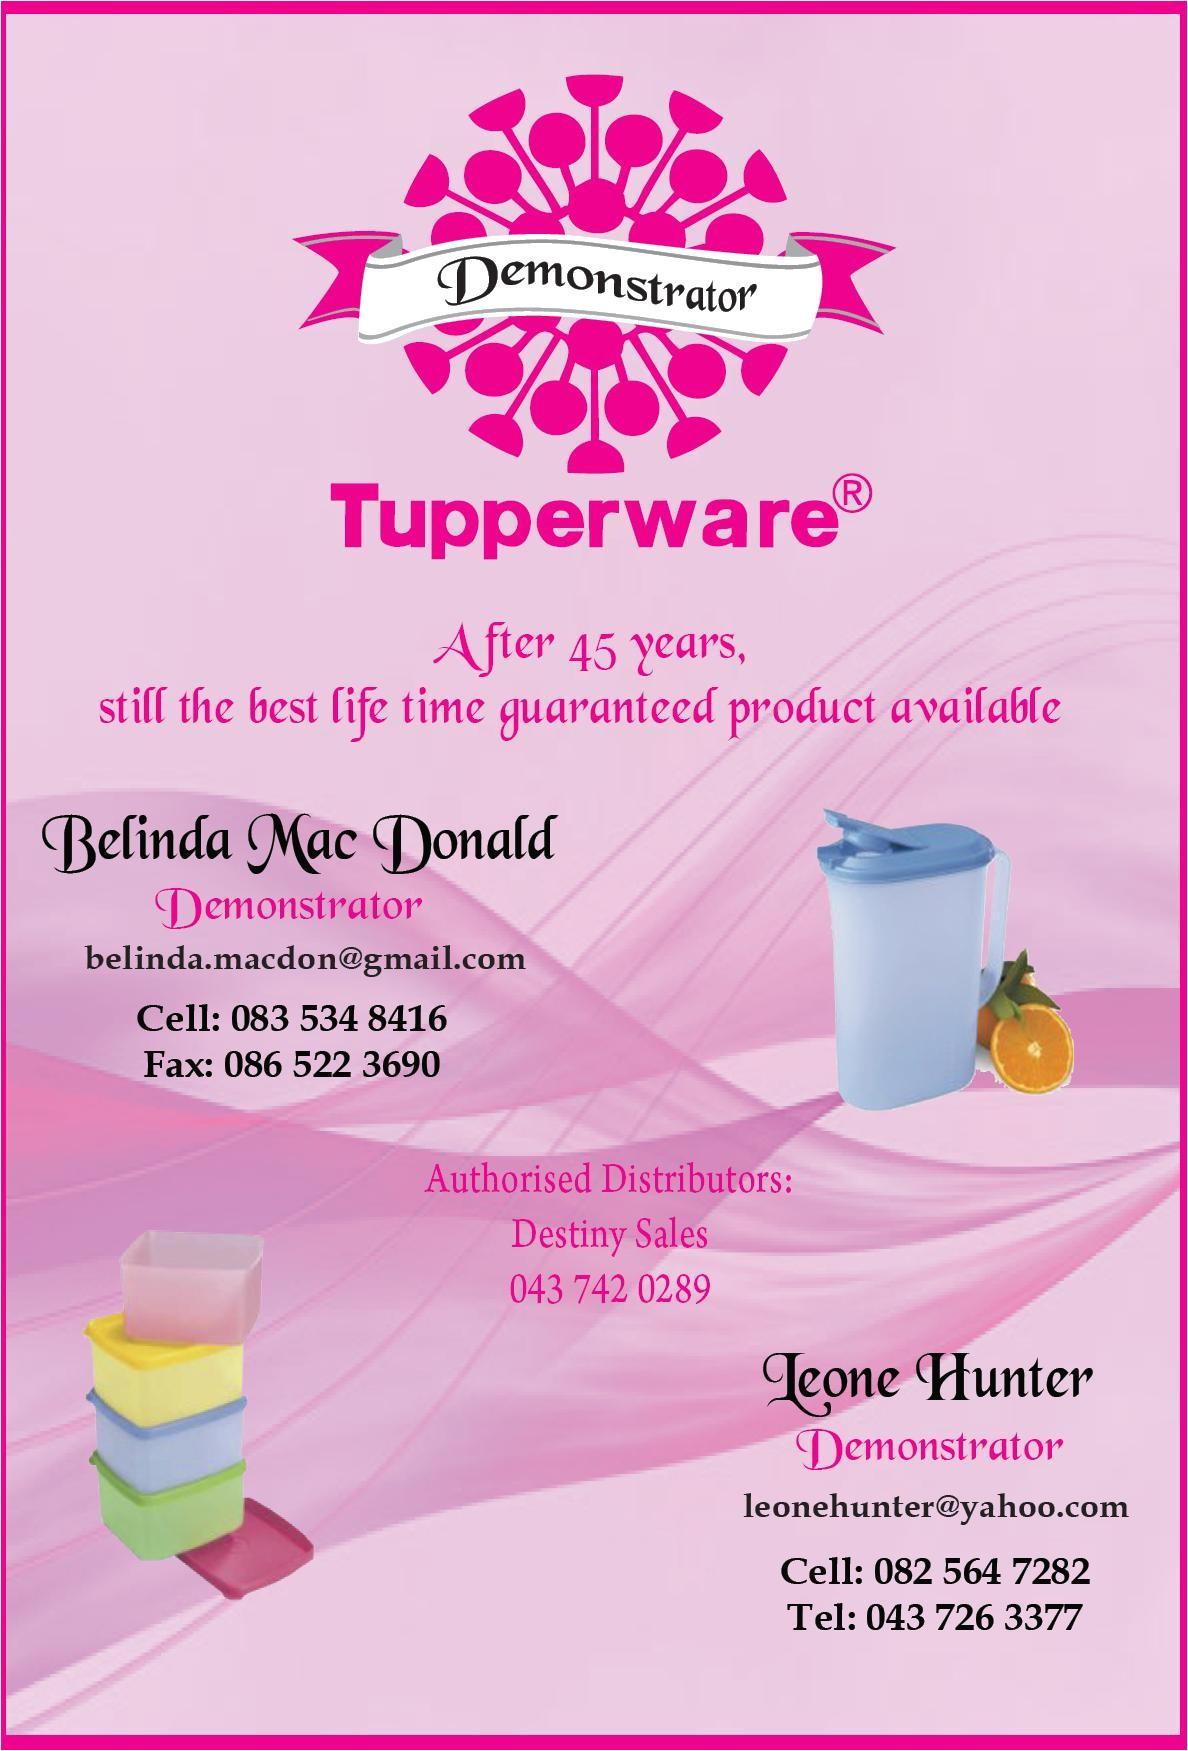 Tupperware Party Invitations Tupperware Party Invitations Cimvitation